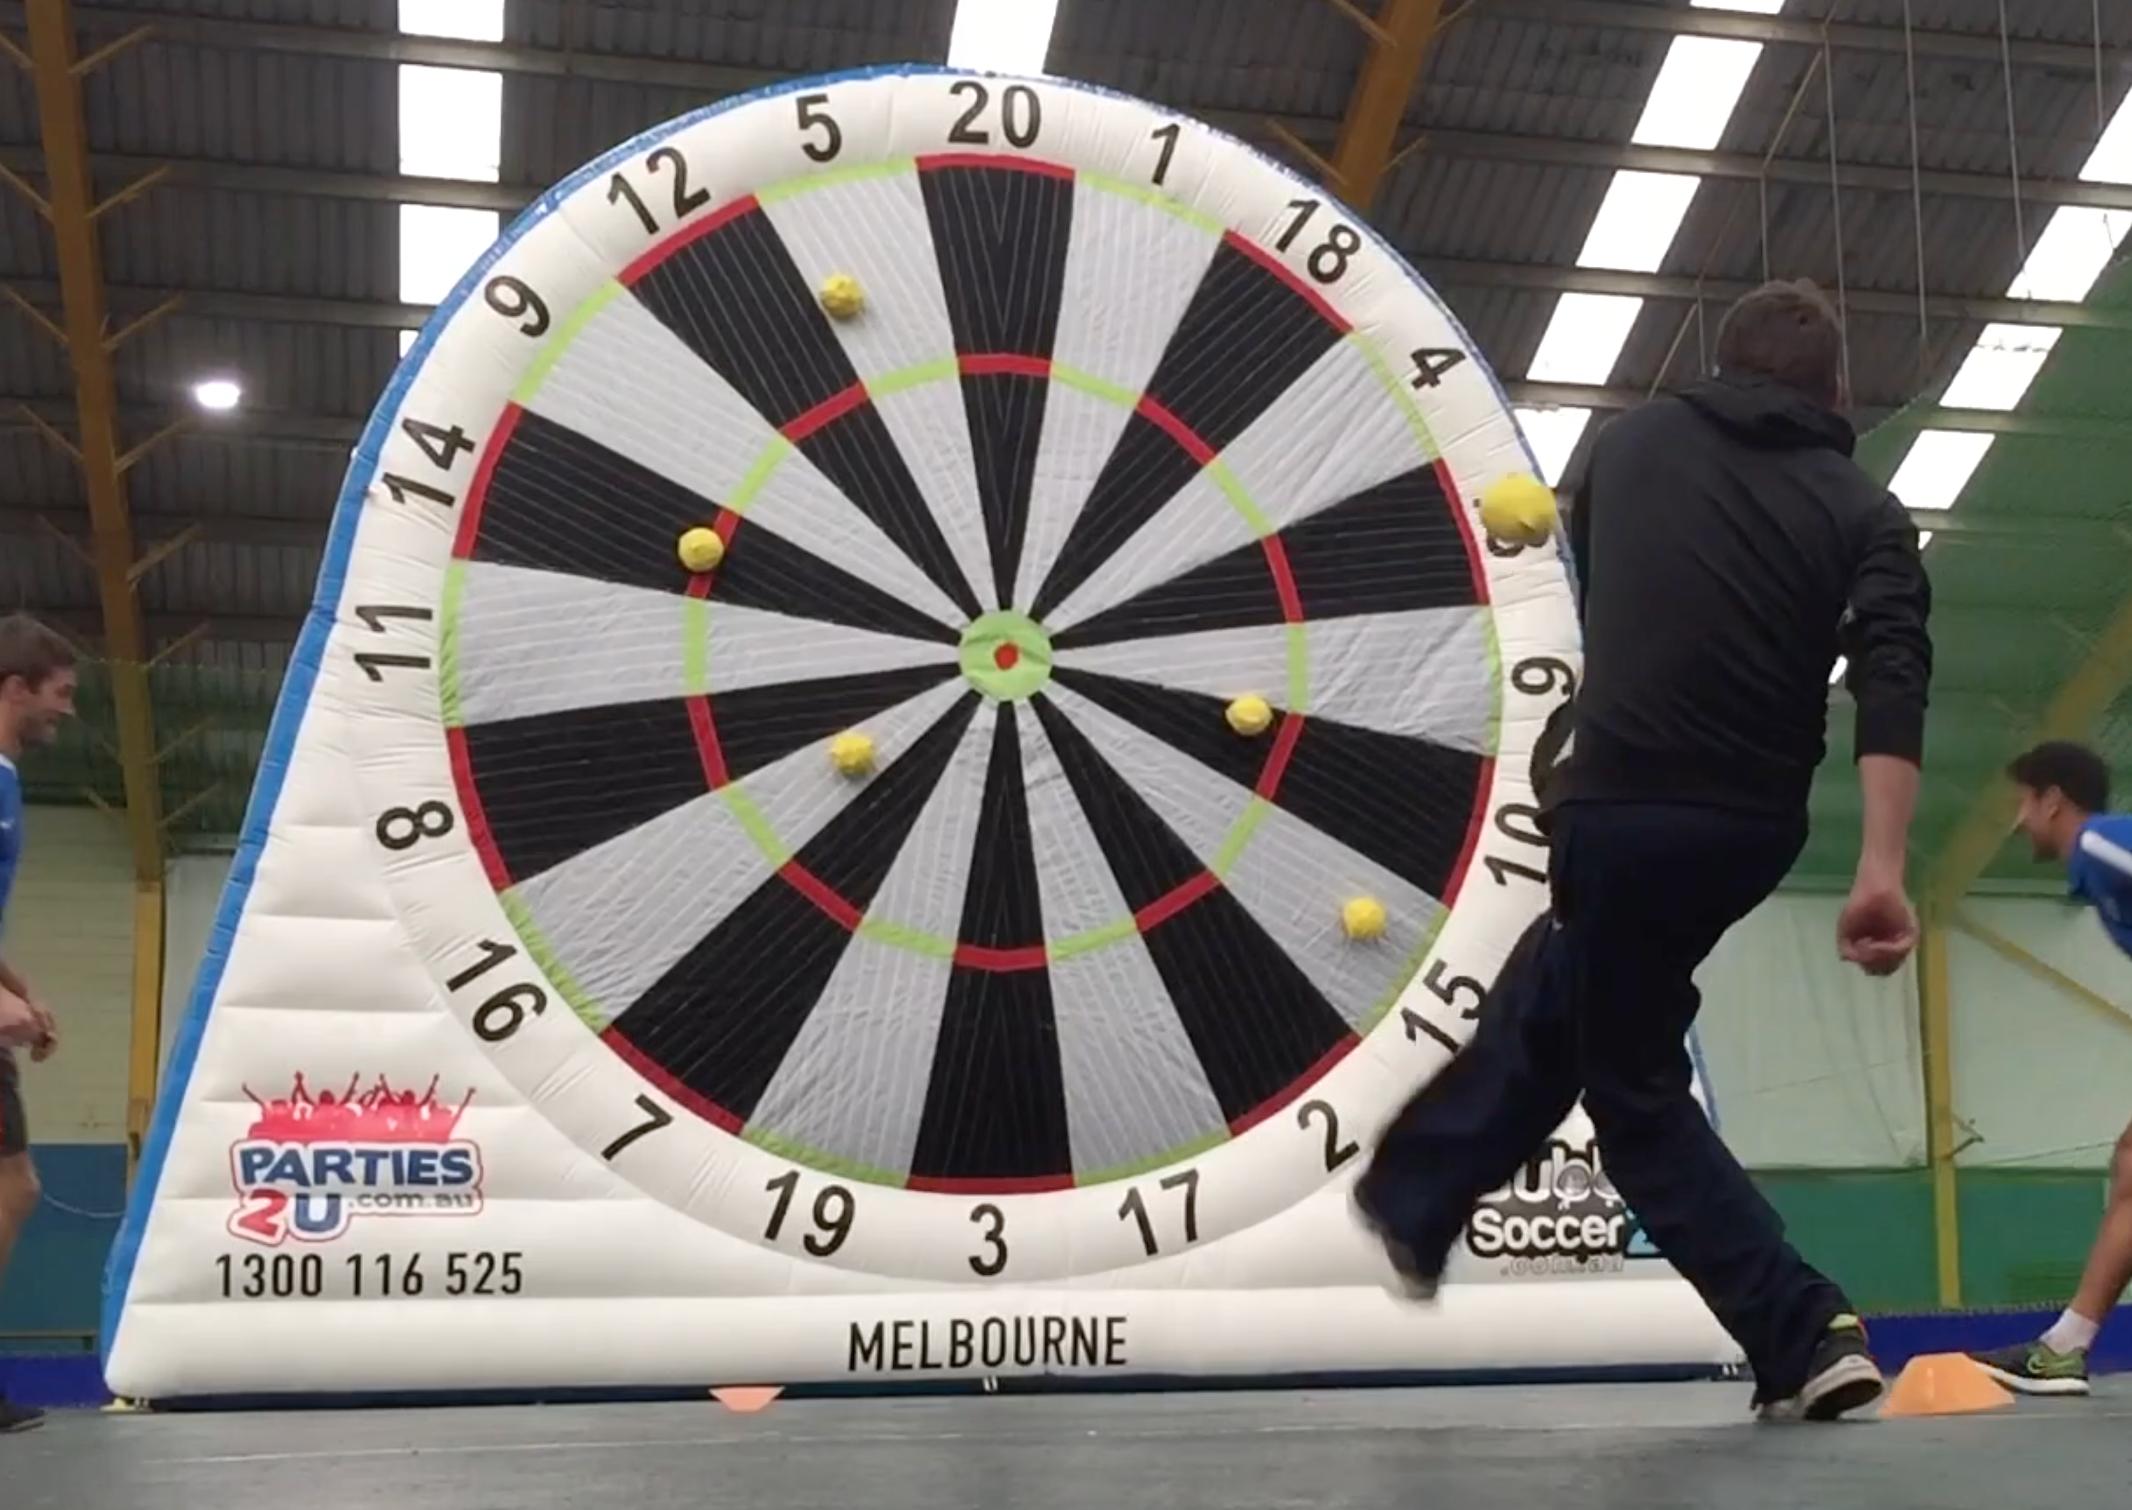 soccer-darts-melbourne.jpg